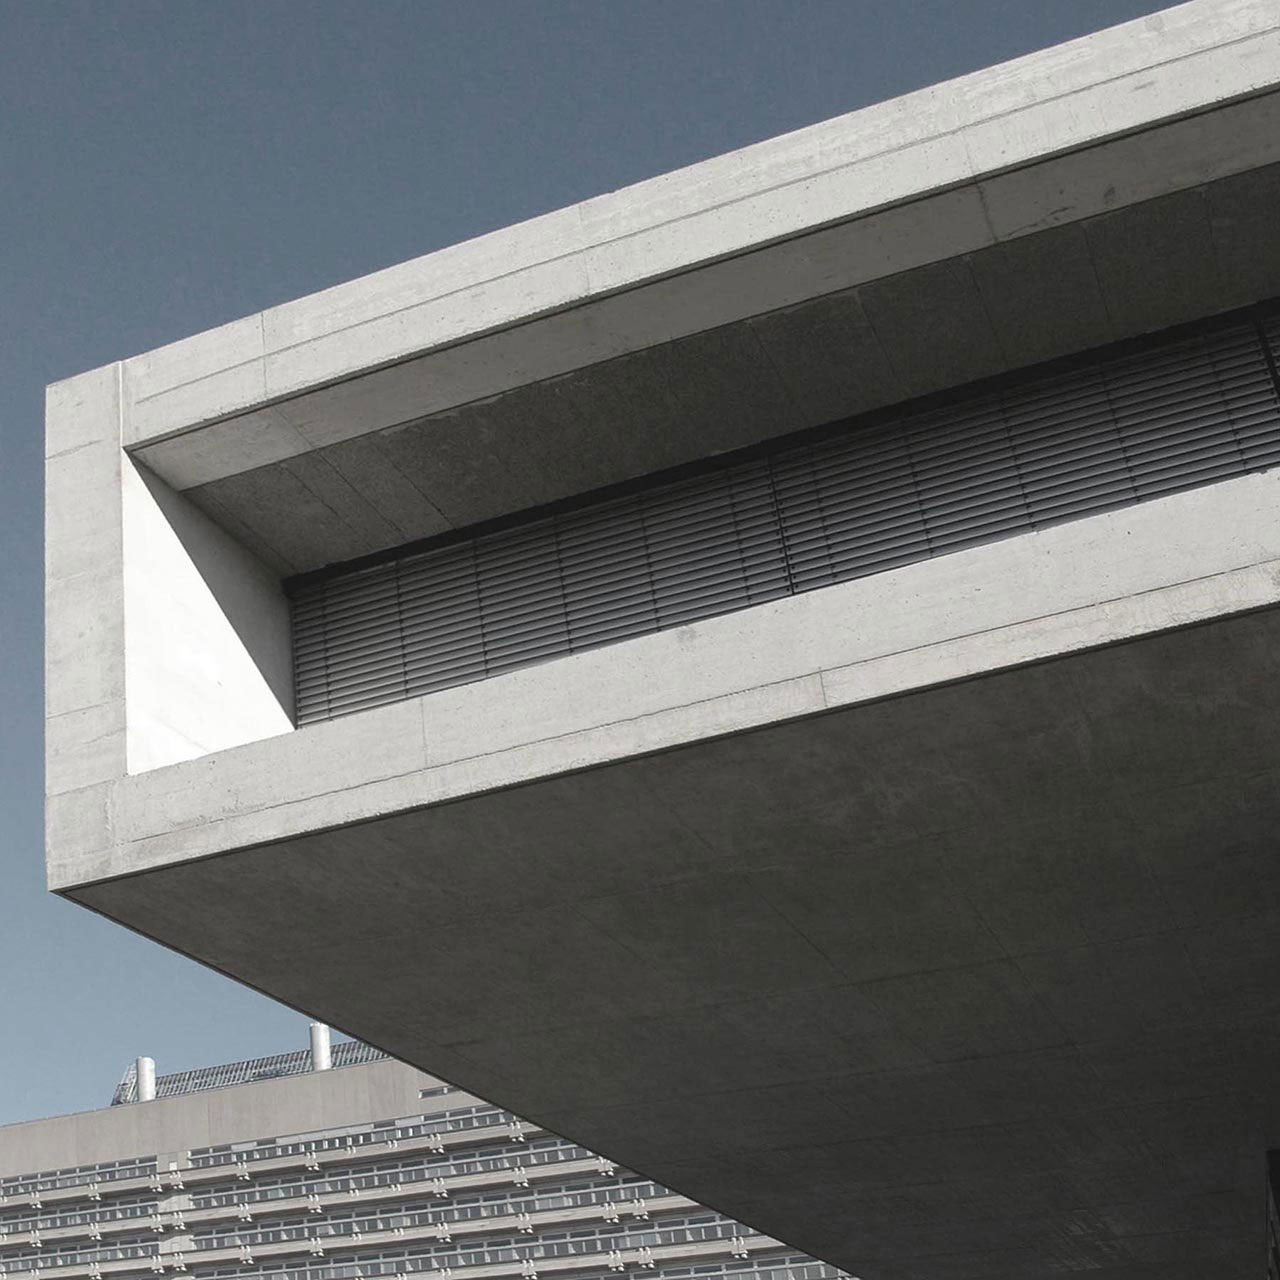 Neubau IZ Vaihingen, Fassadendetail